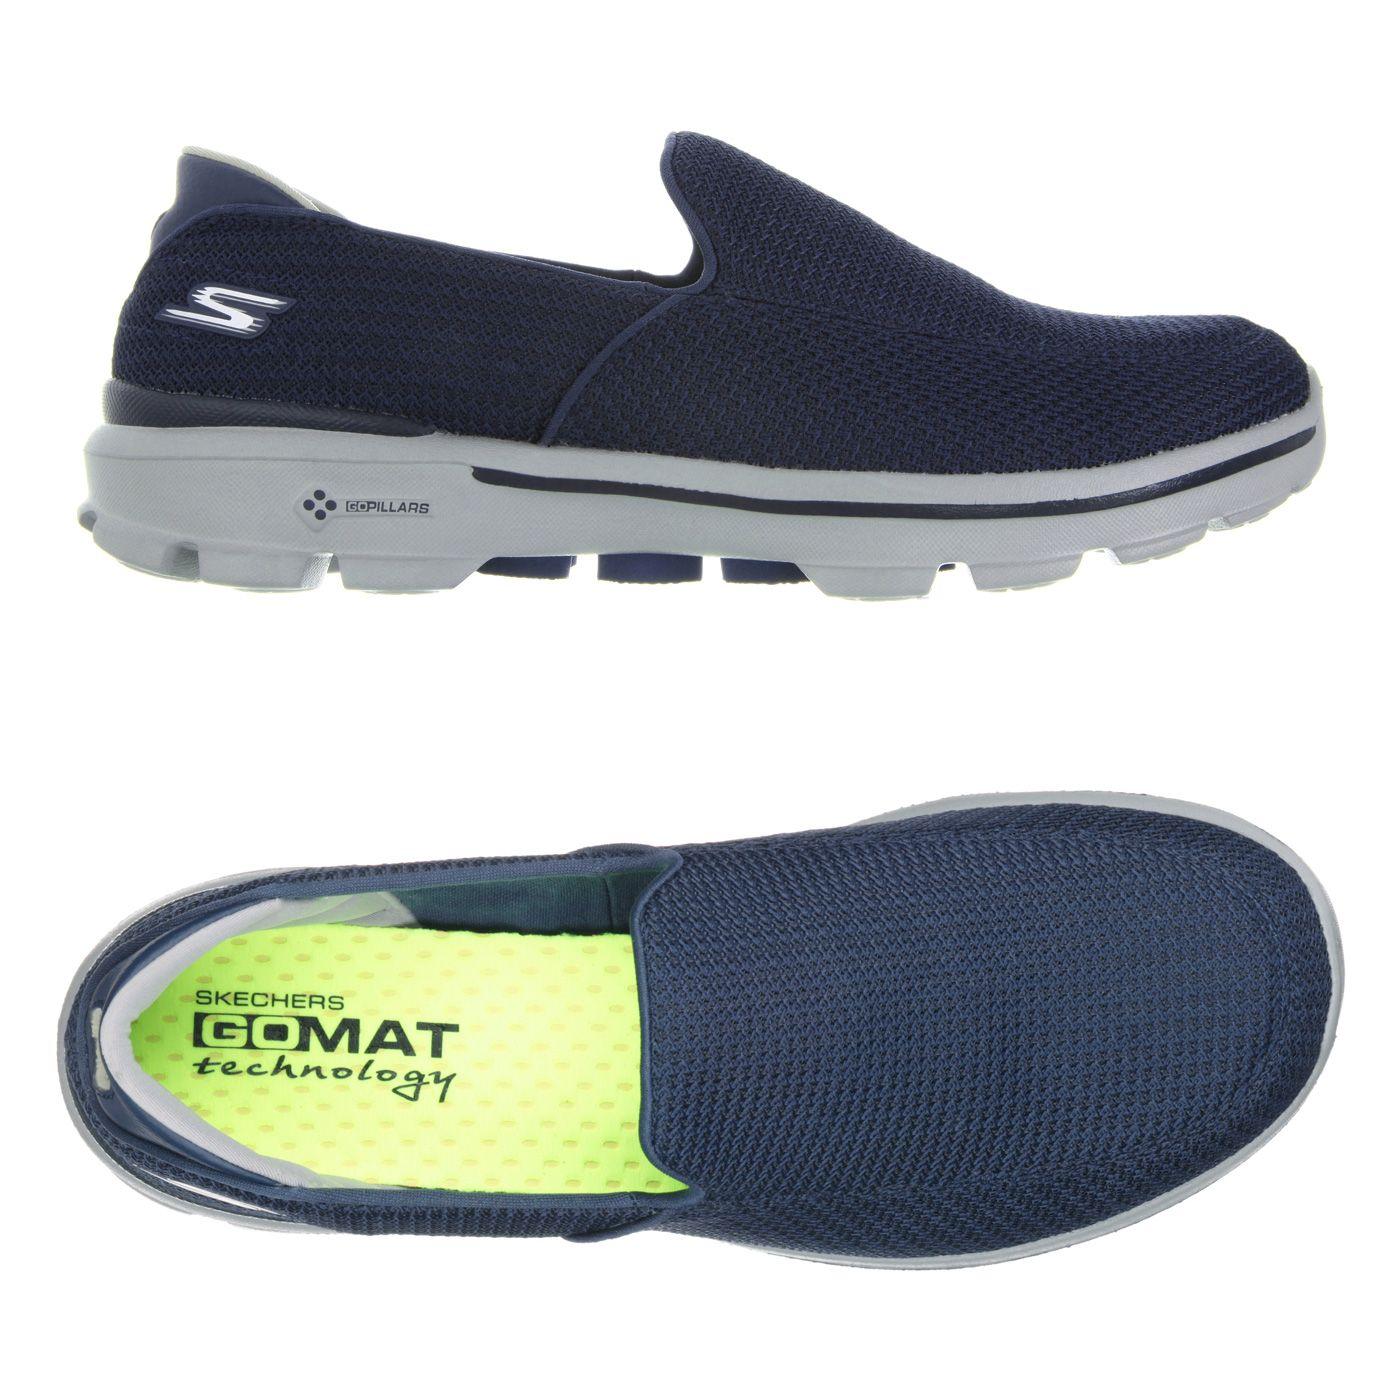 Walking Around In Running Shoes